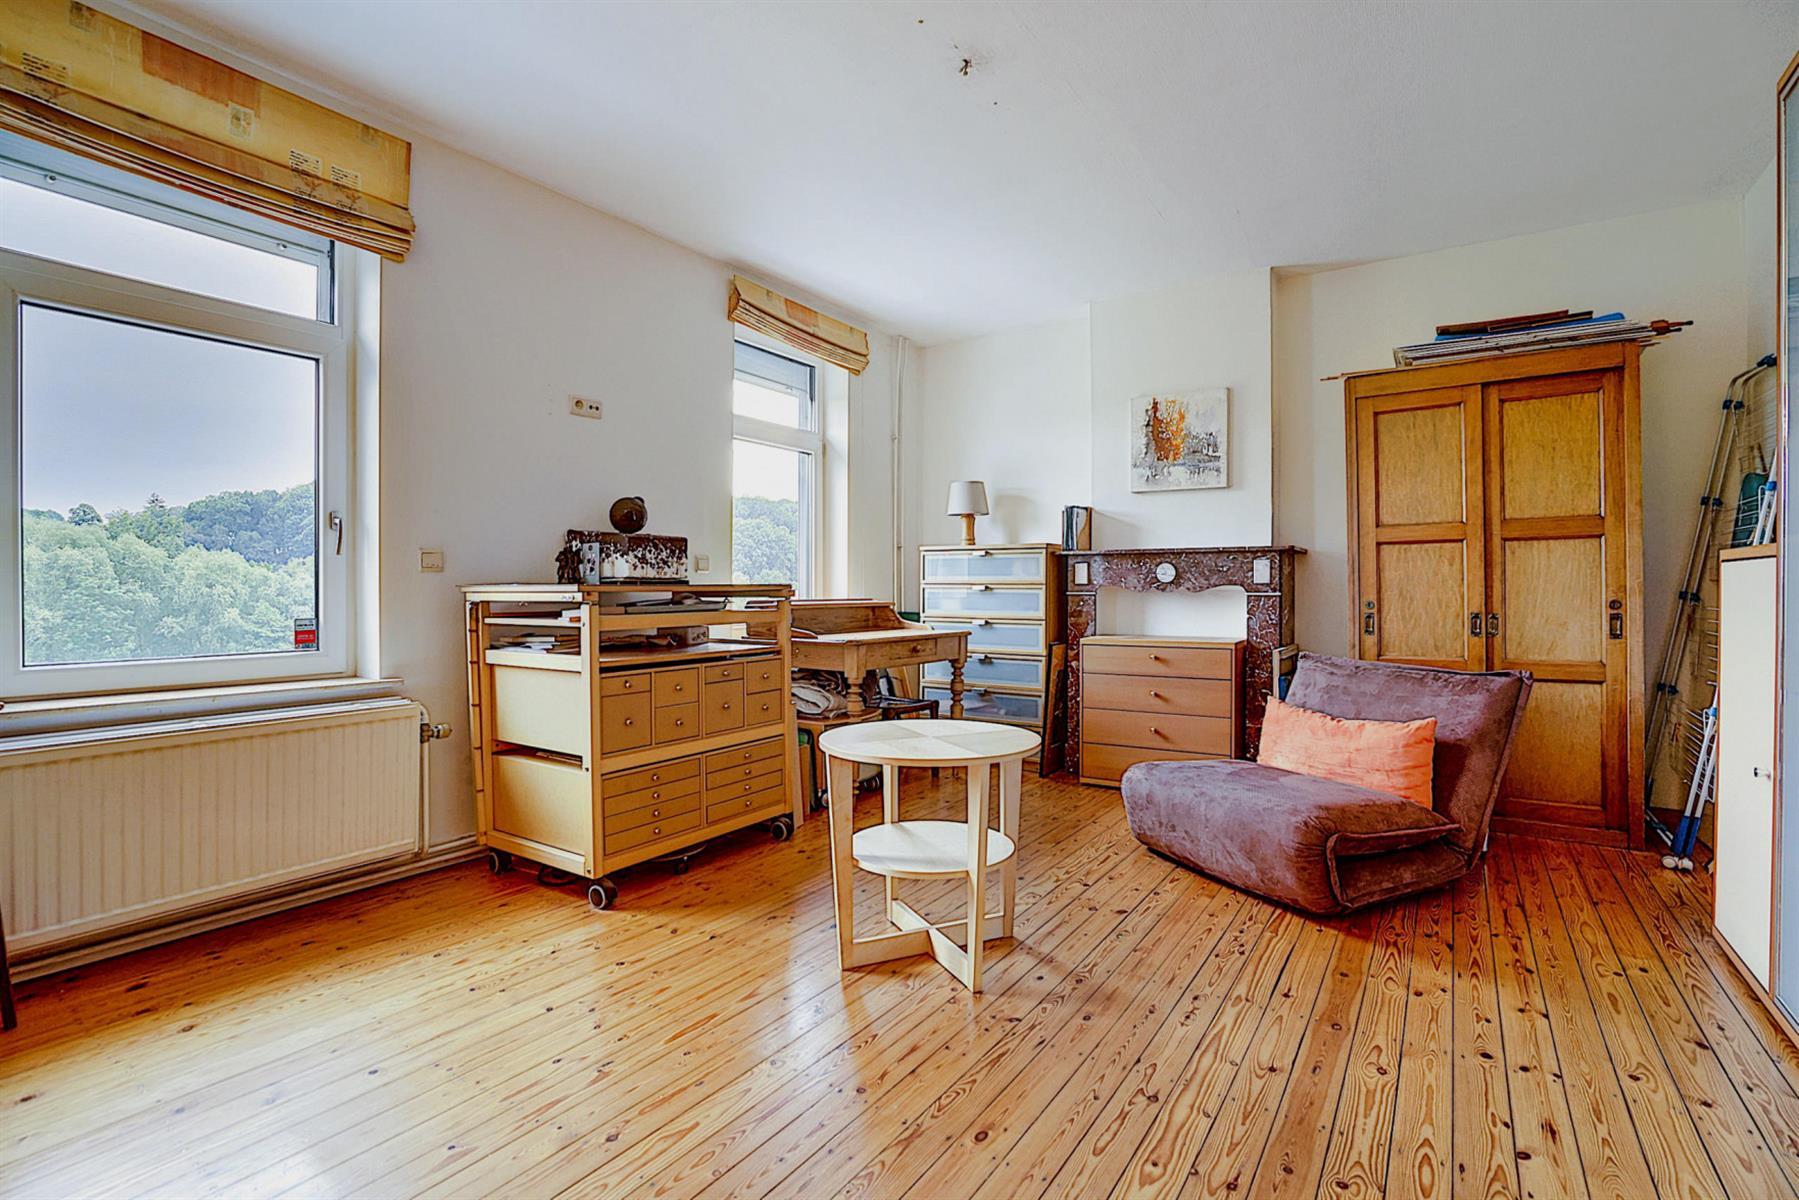 Maison - Bousval - #4395358-18